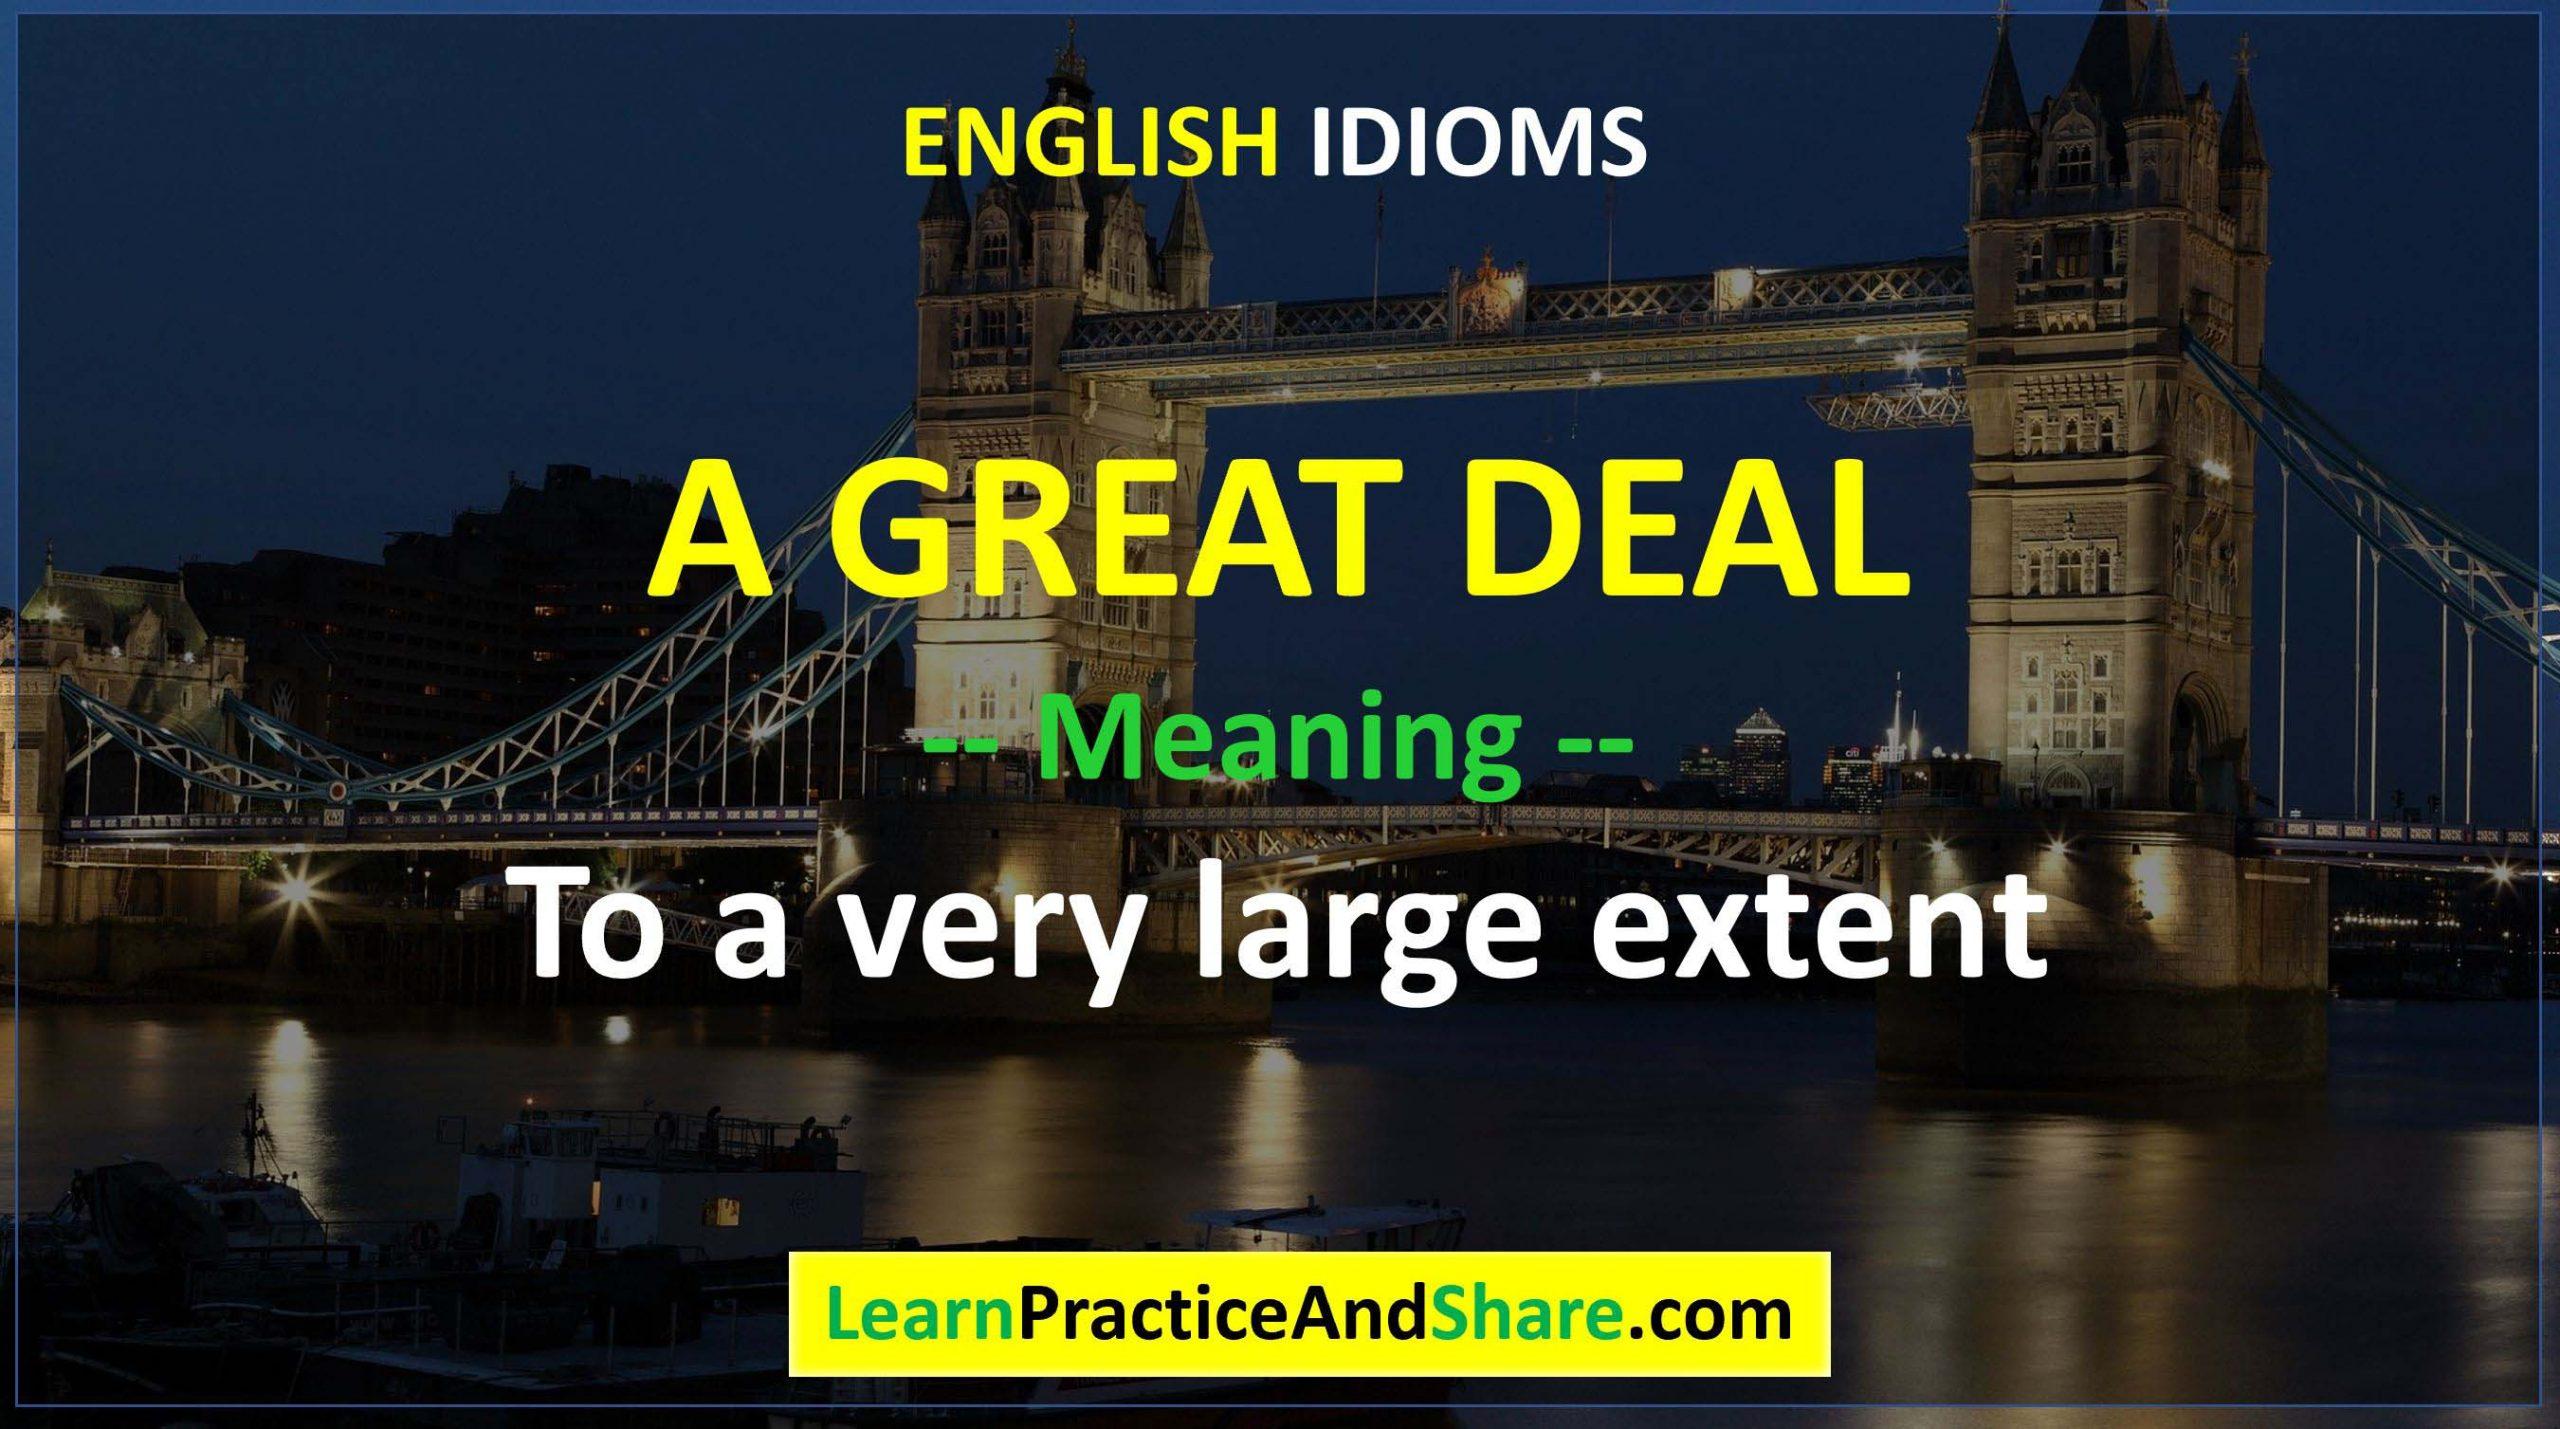 English Idiom - A Great Deal